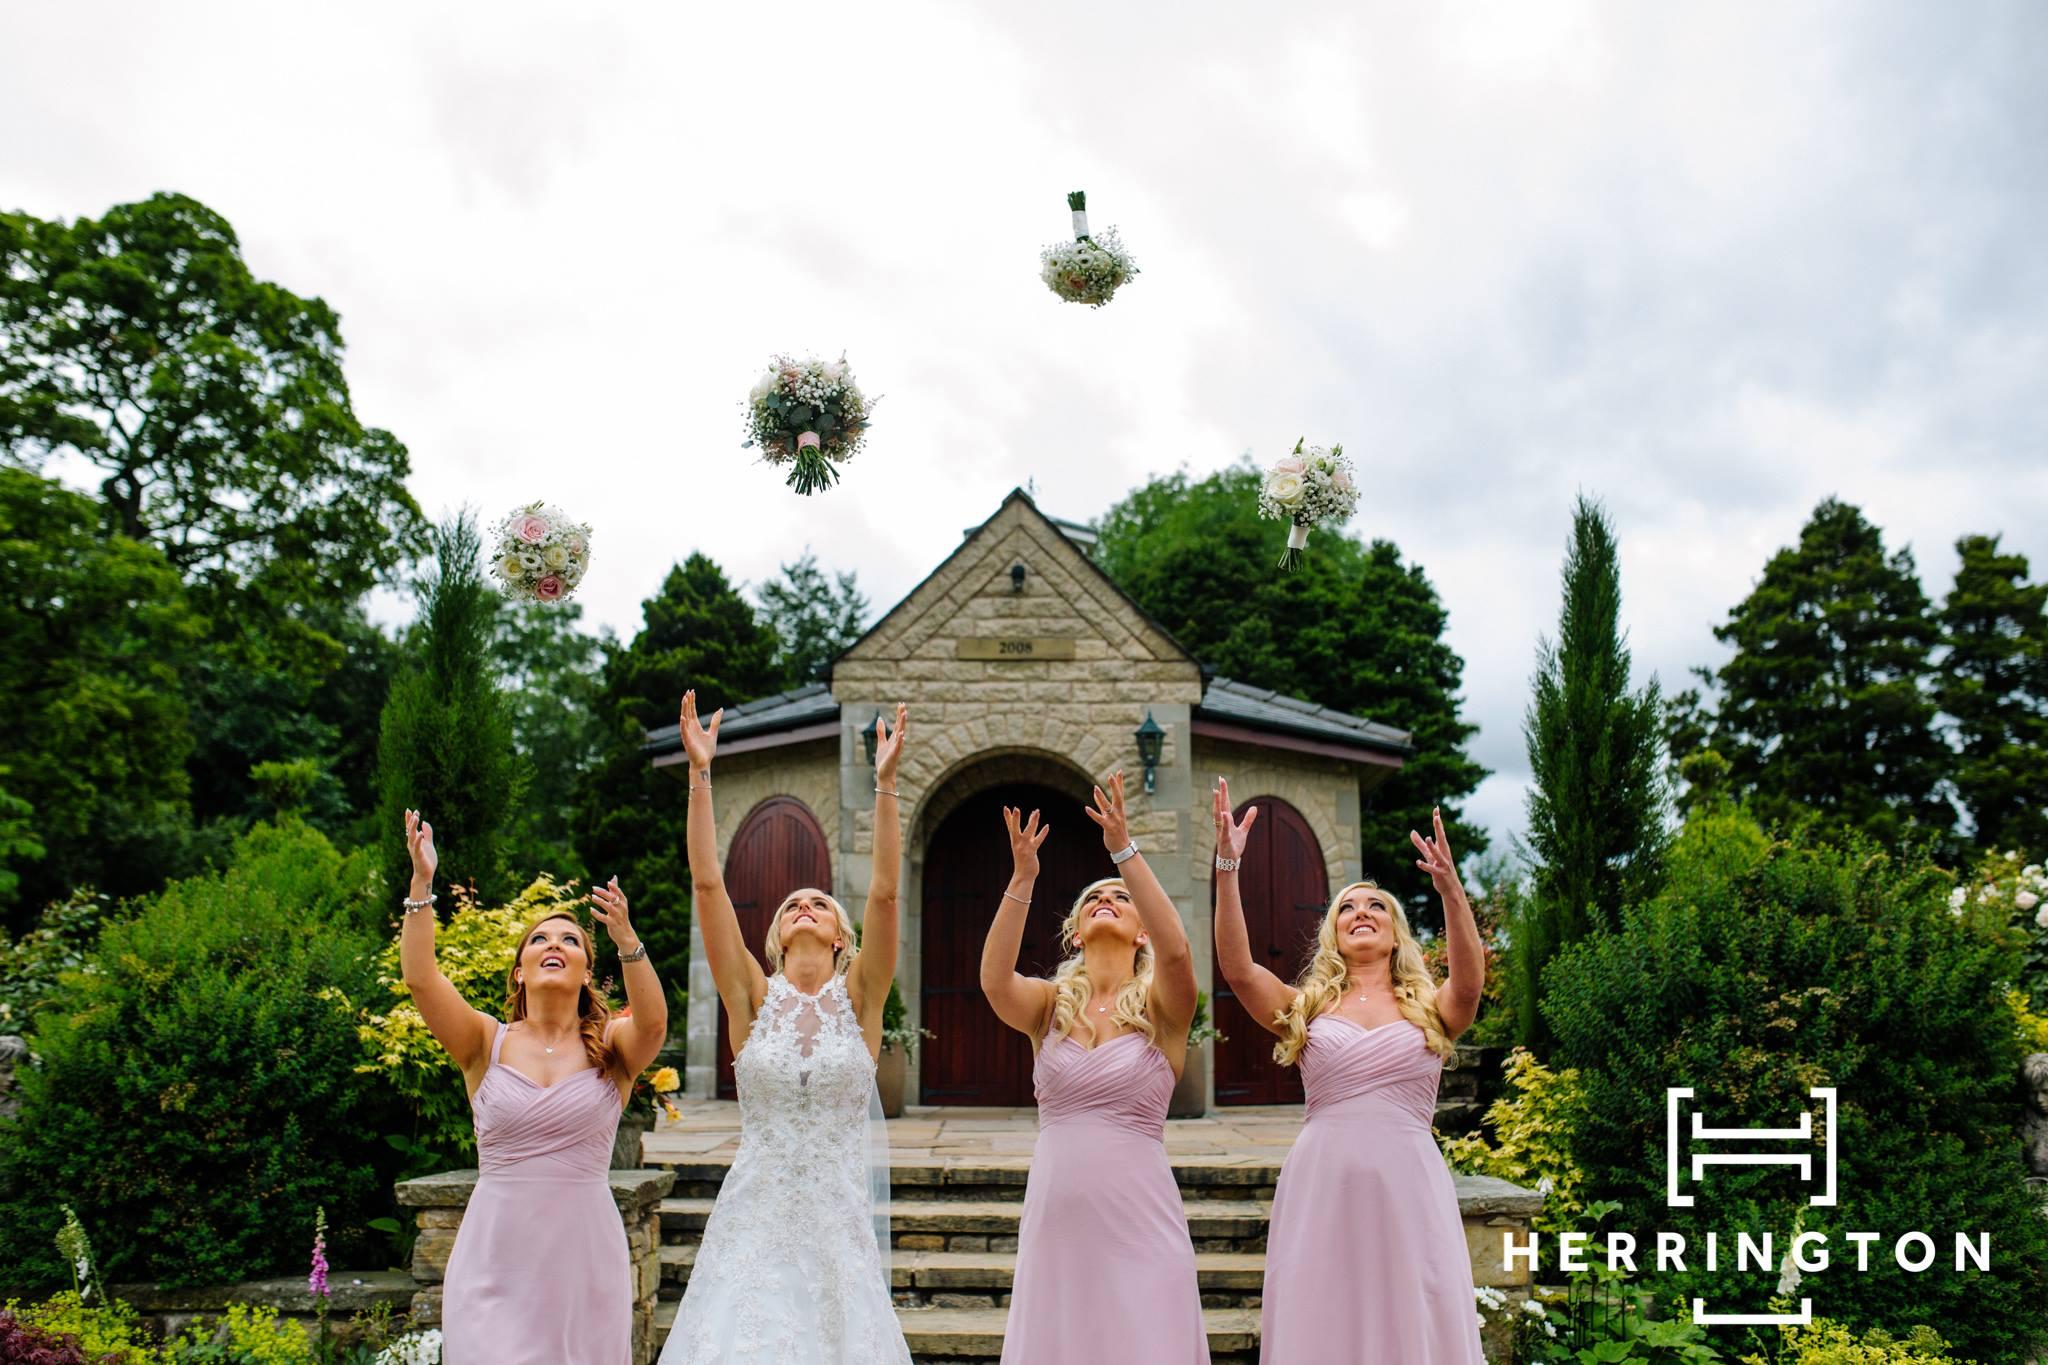 Bridesmaids pictures Matt Herrington Wedding Photographer Lancashire North West